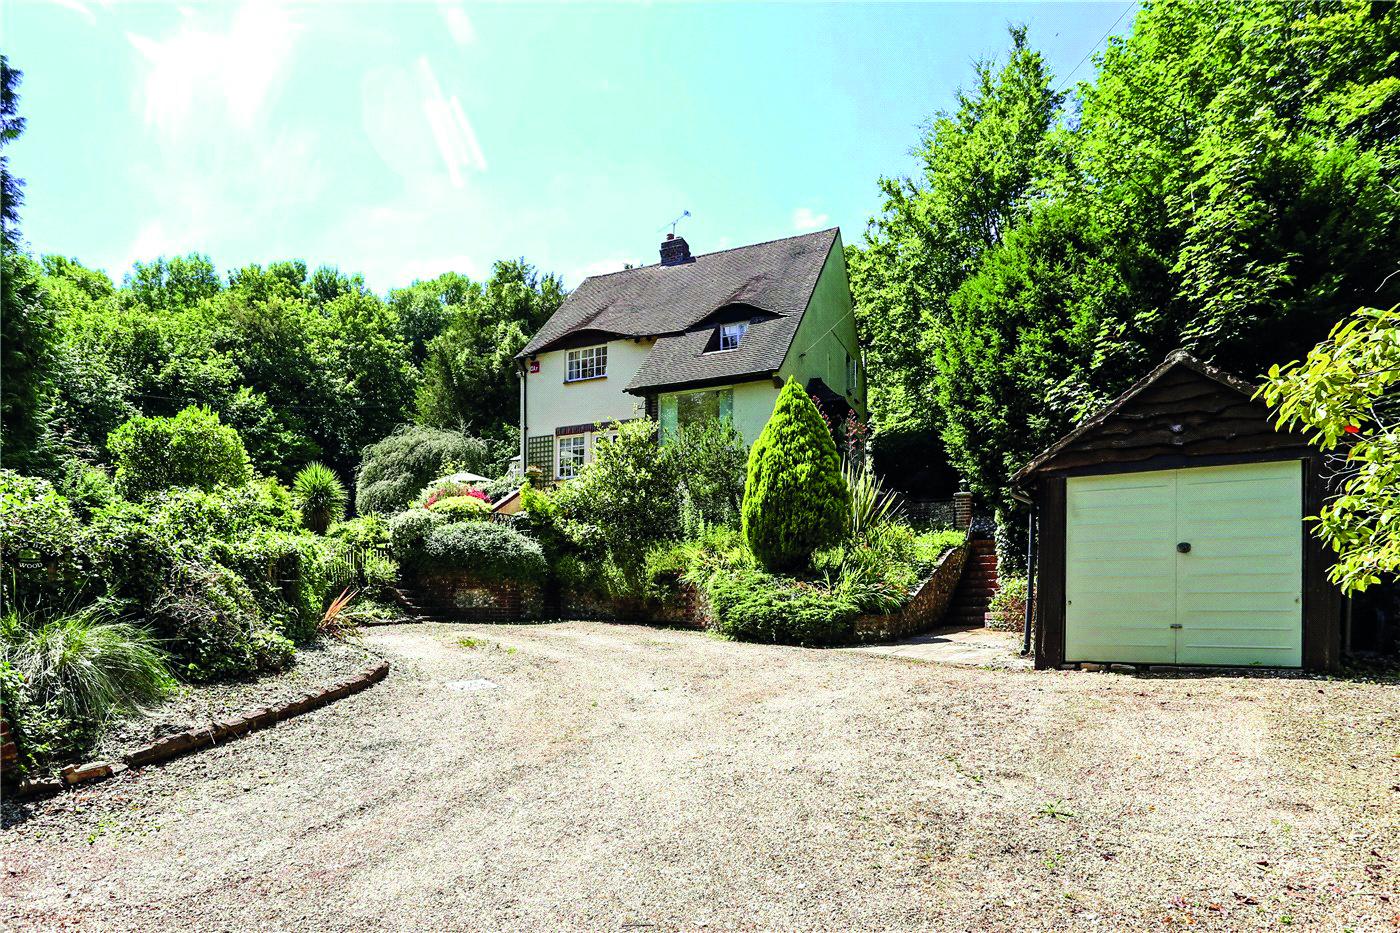 3 bedroom house in Hambledon, PO7